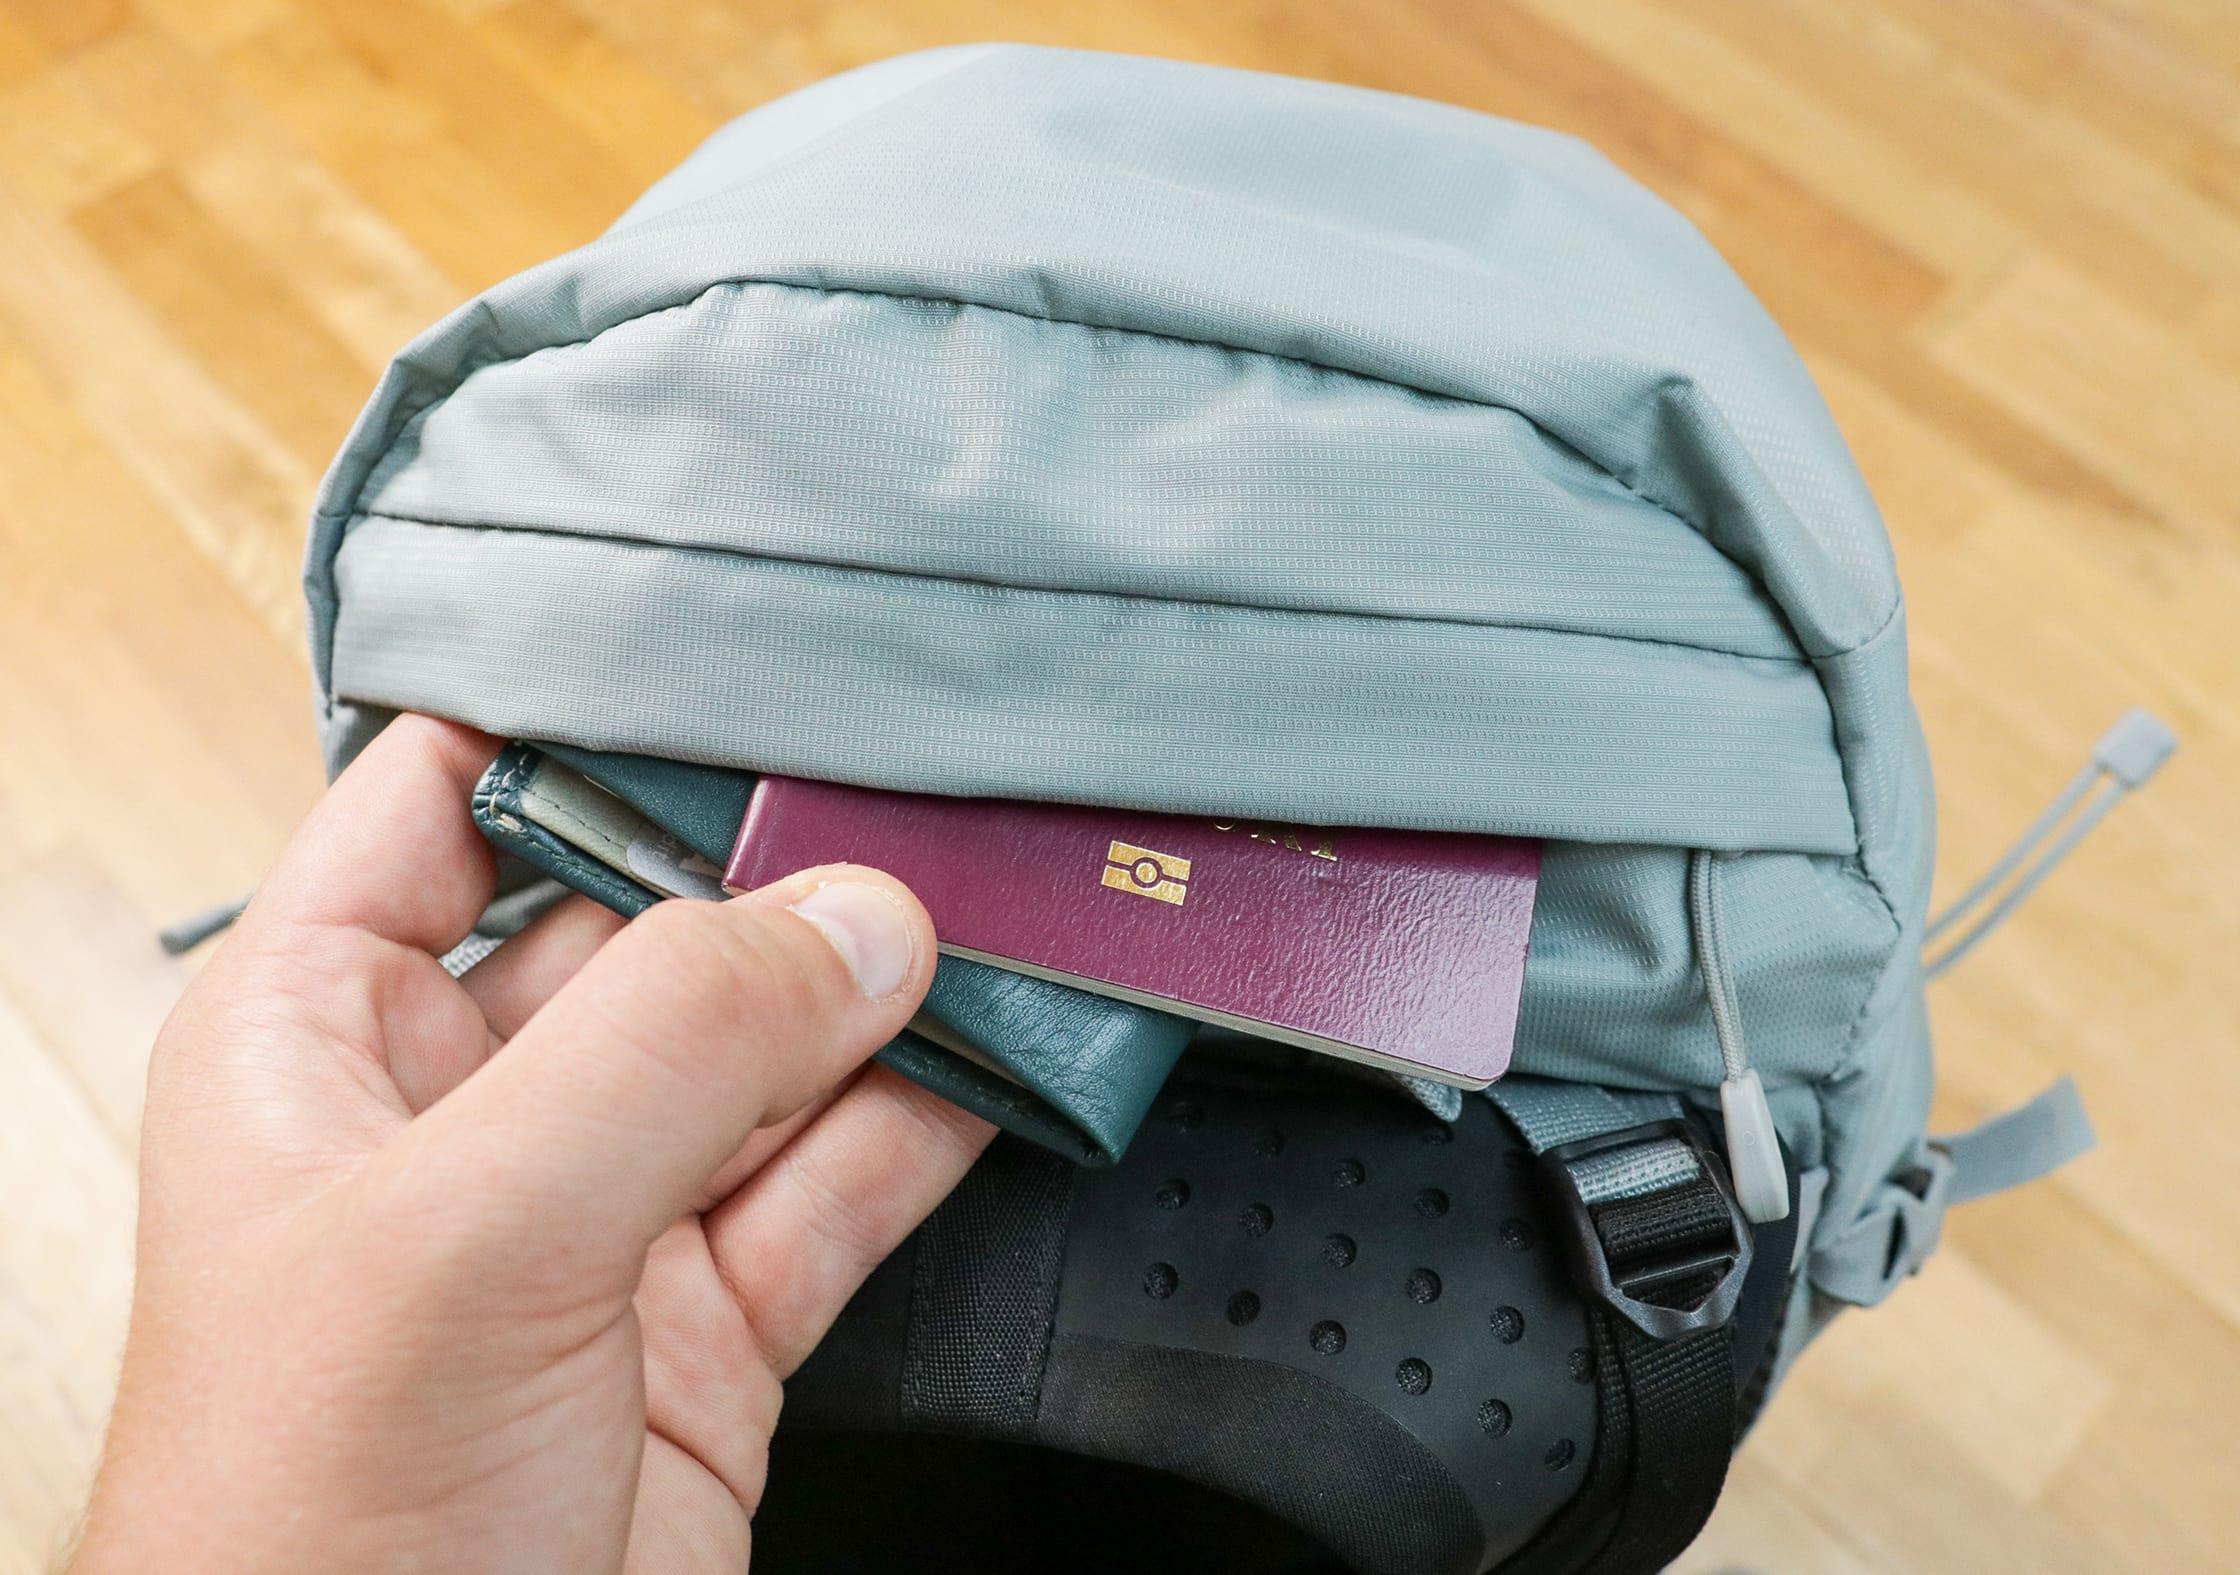 Lowe Alpine Aeon Top Quick-Grab Pocket